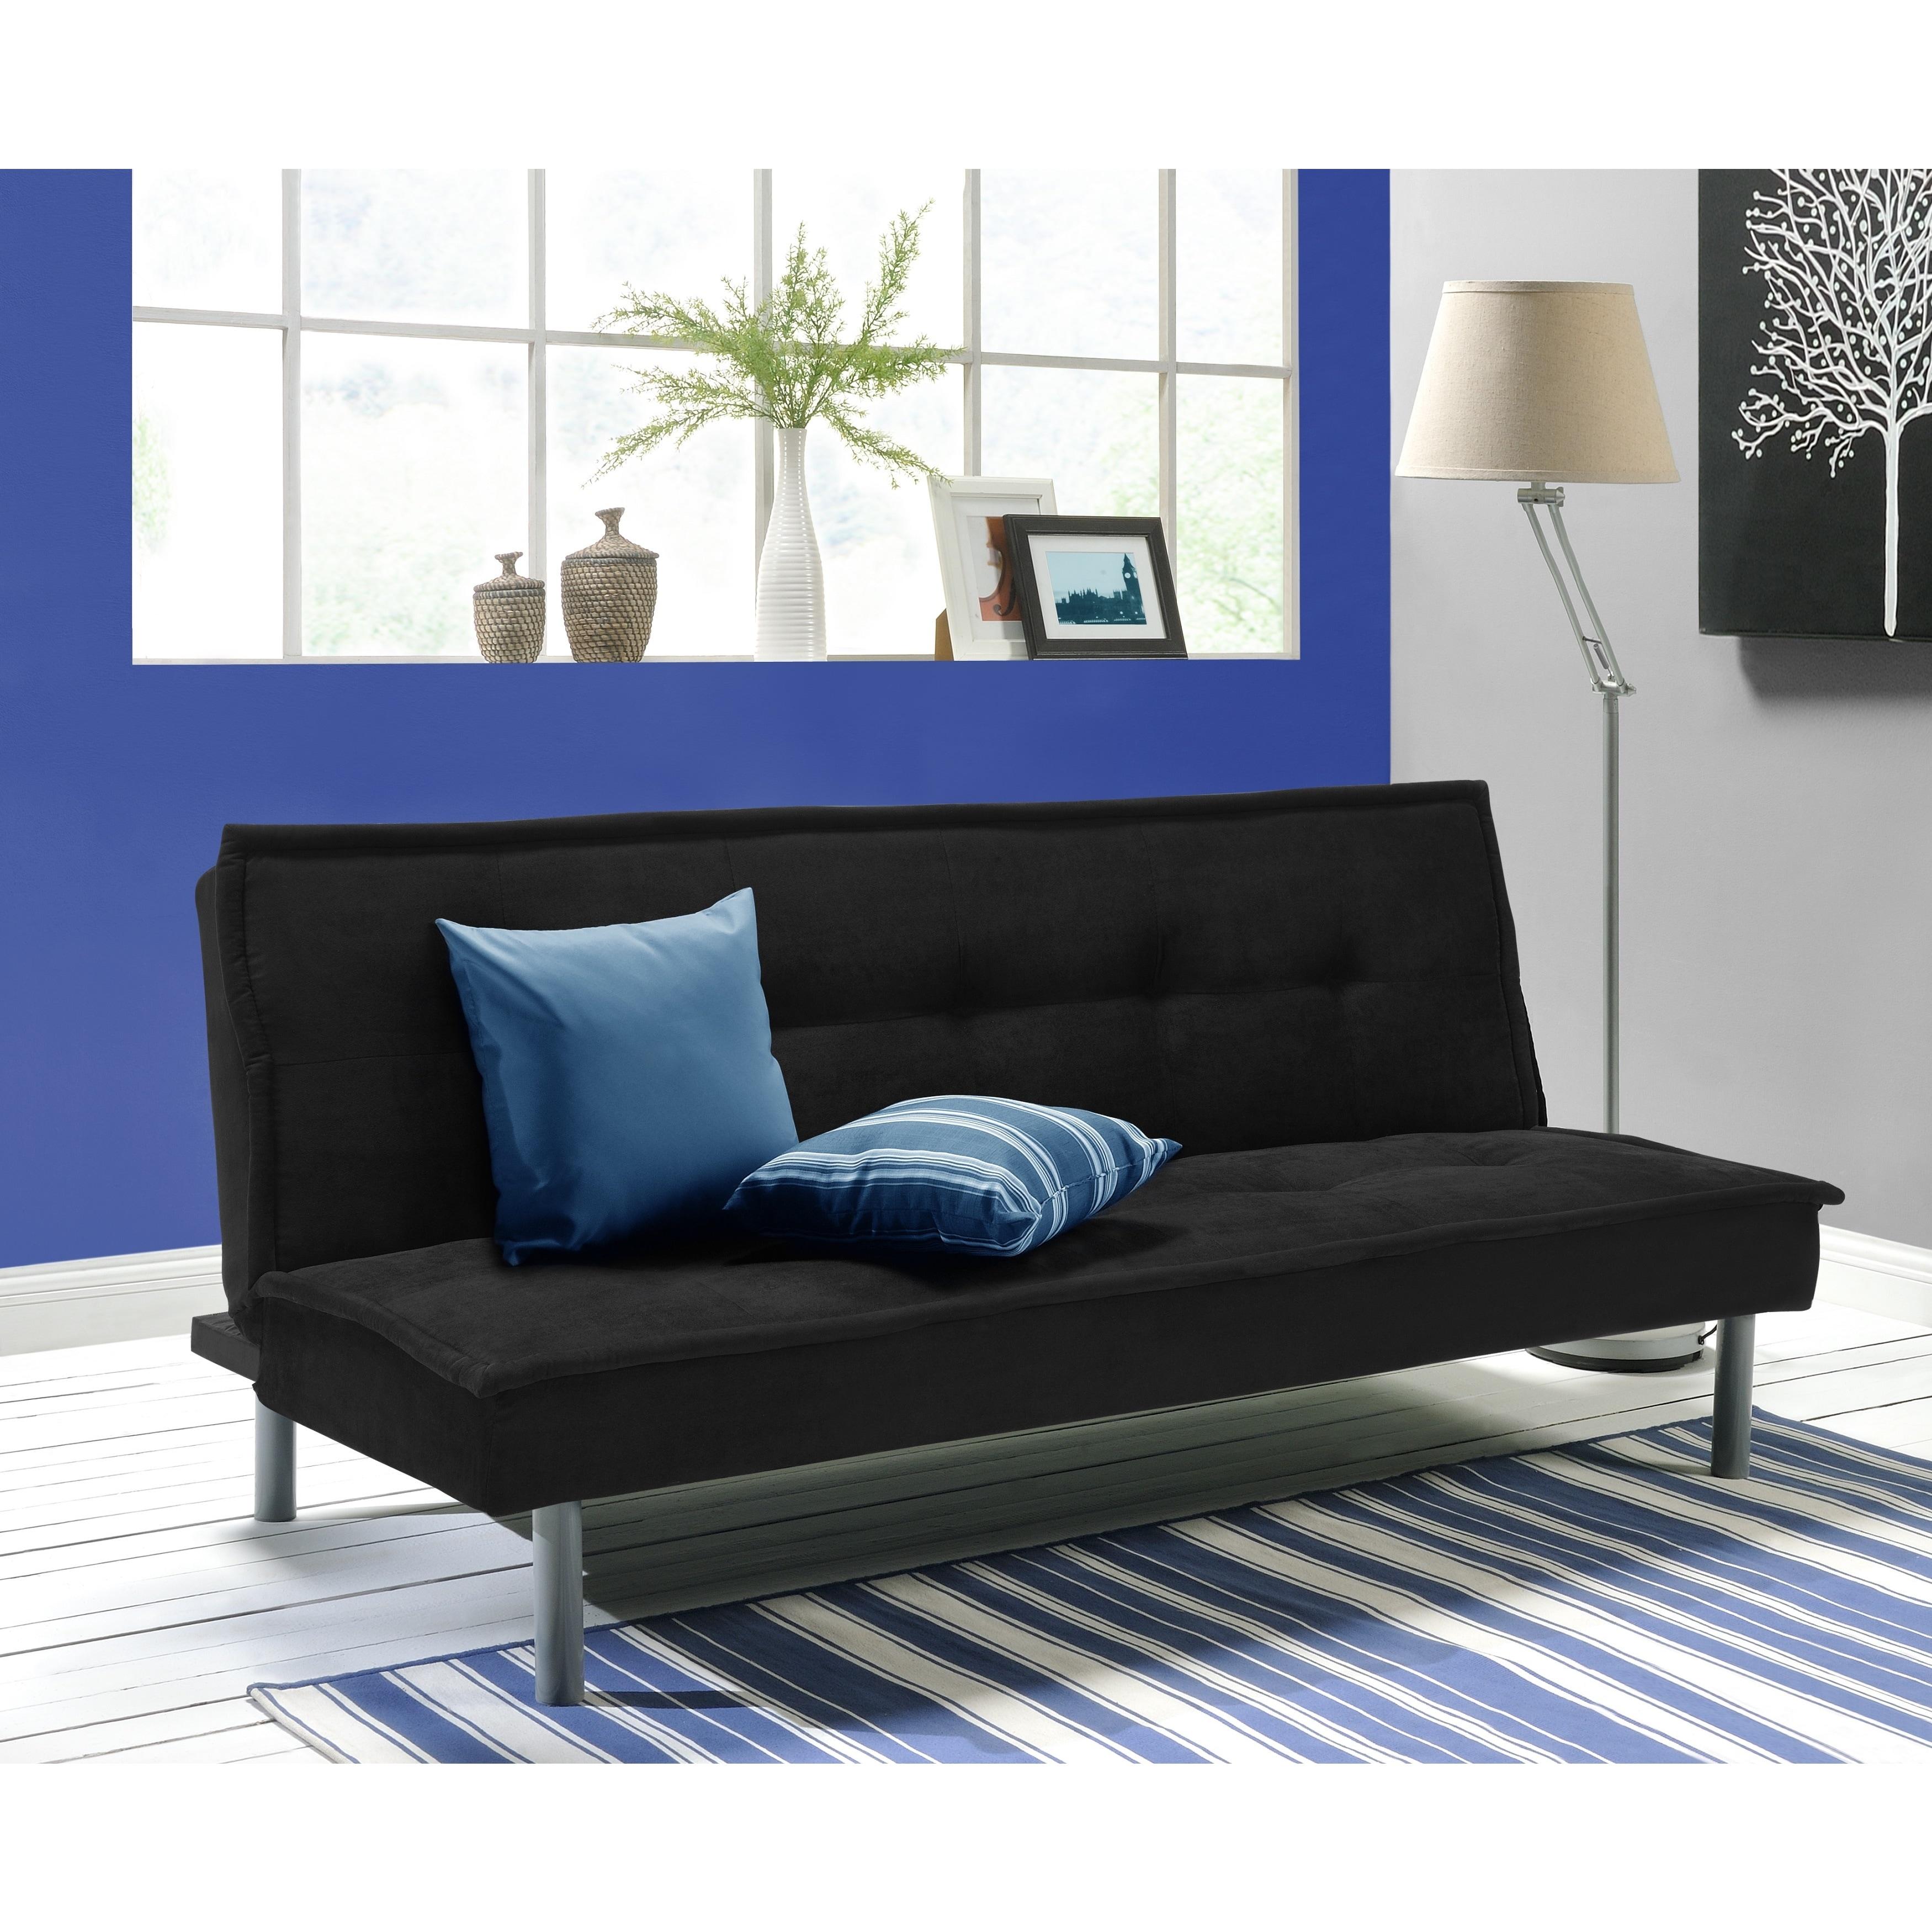 DHP Kent Futon Sofa Bed (Black)